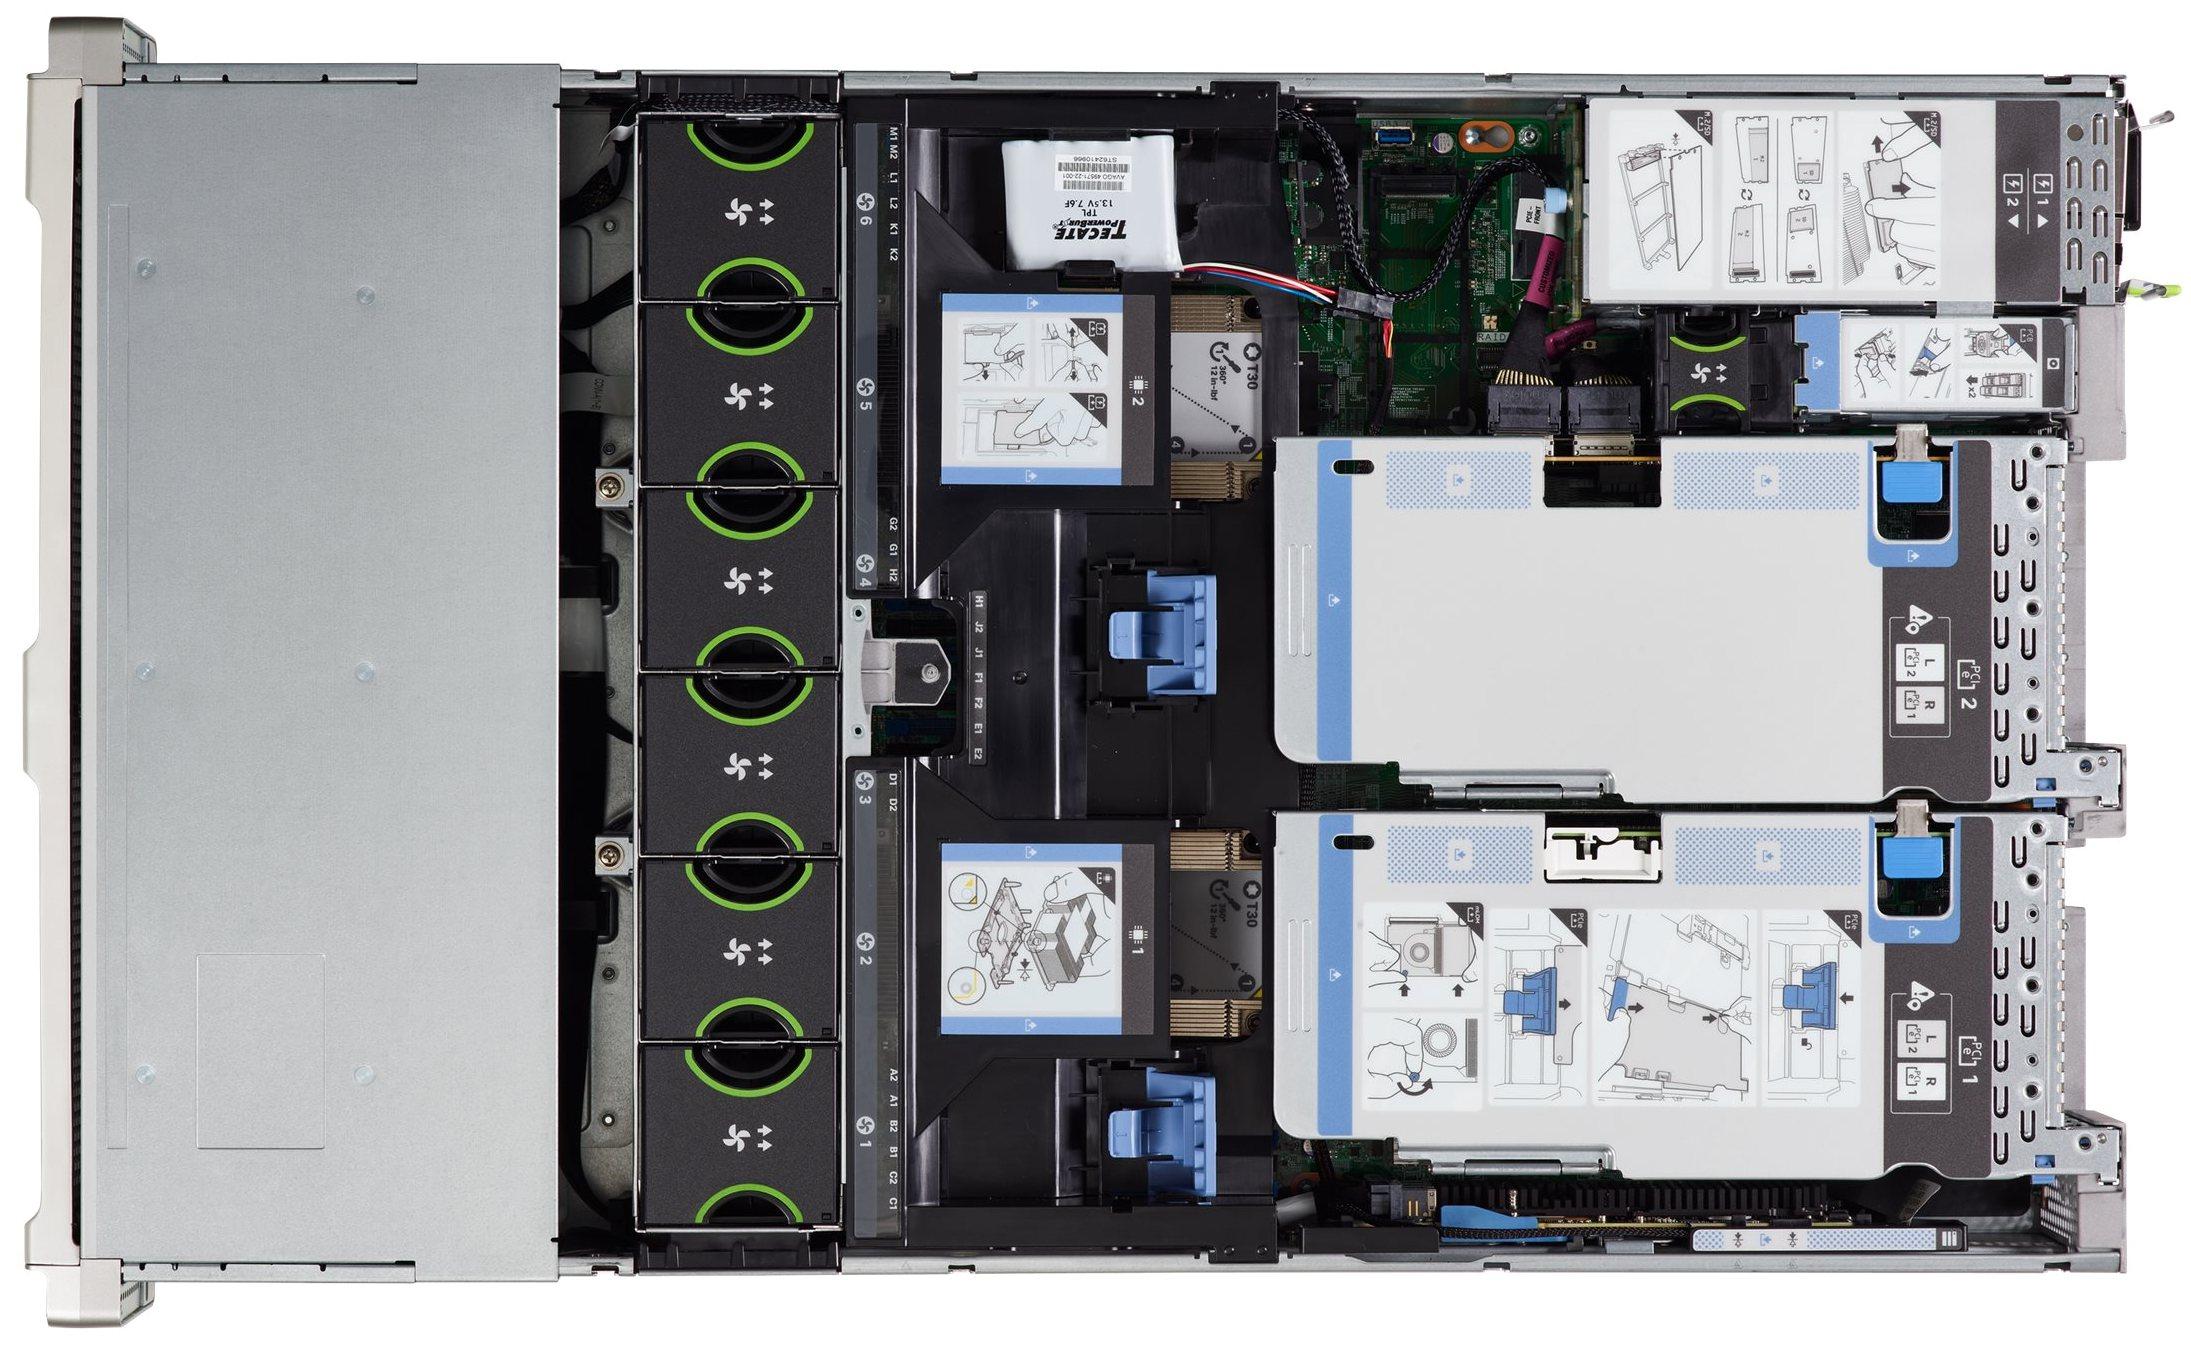 Cisco UCS C240 M5 Top